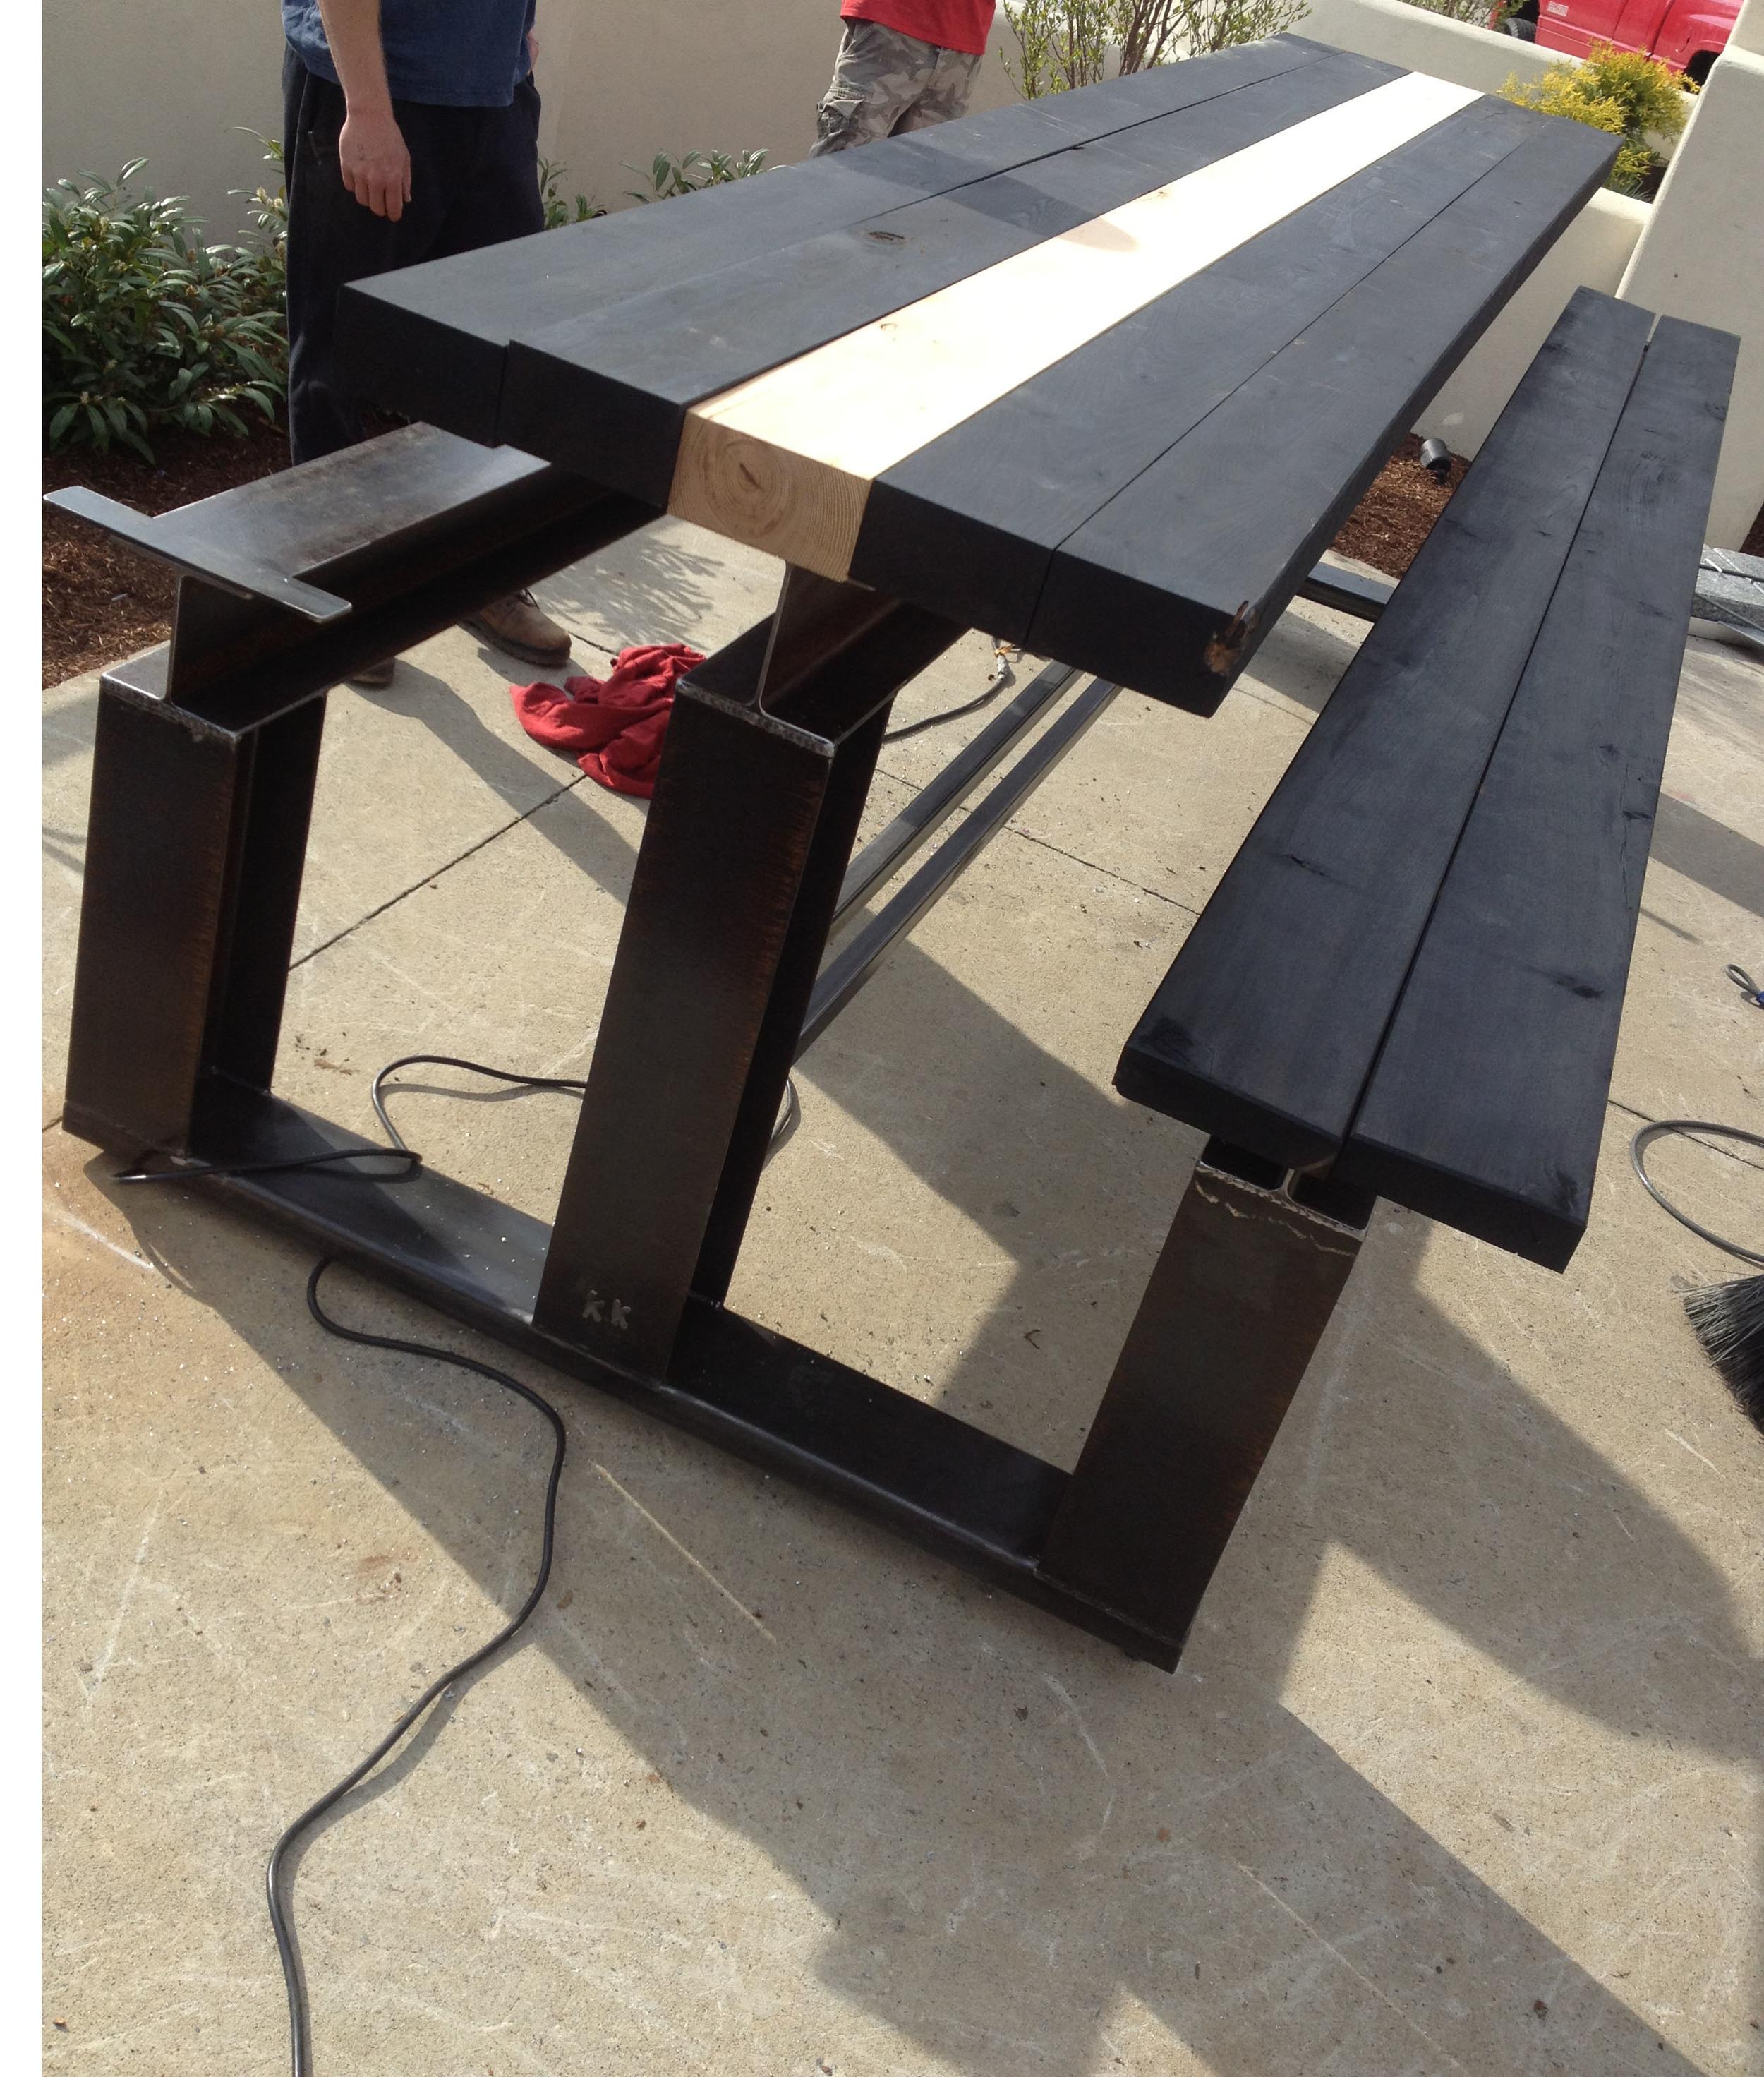 I beam community table